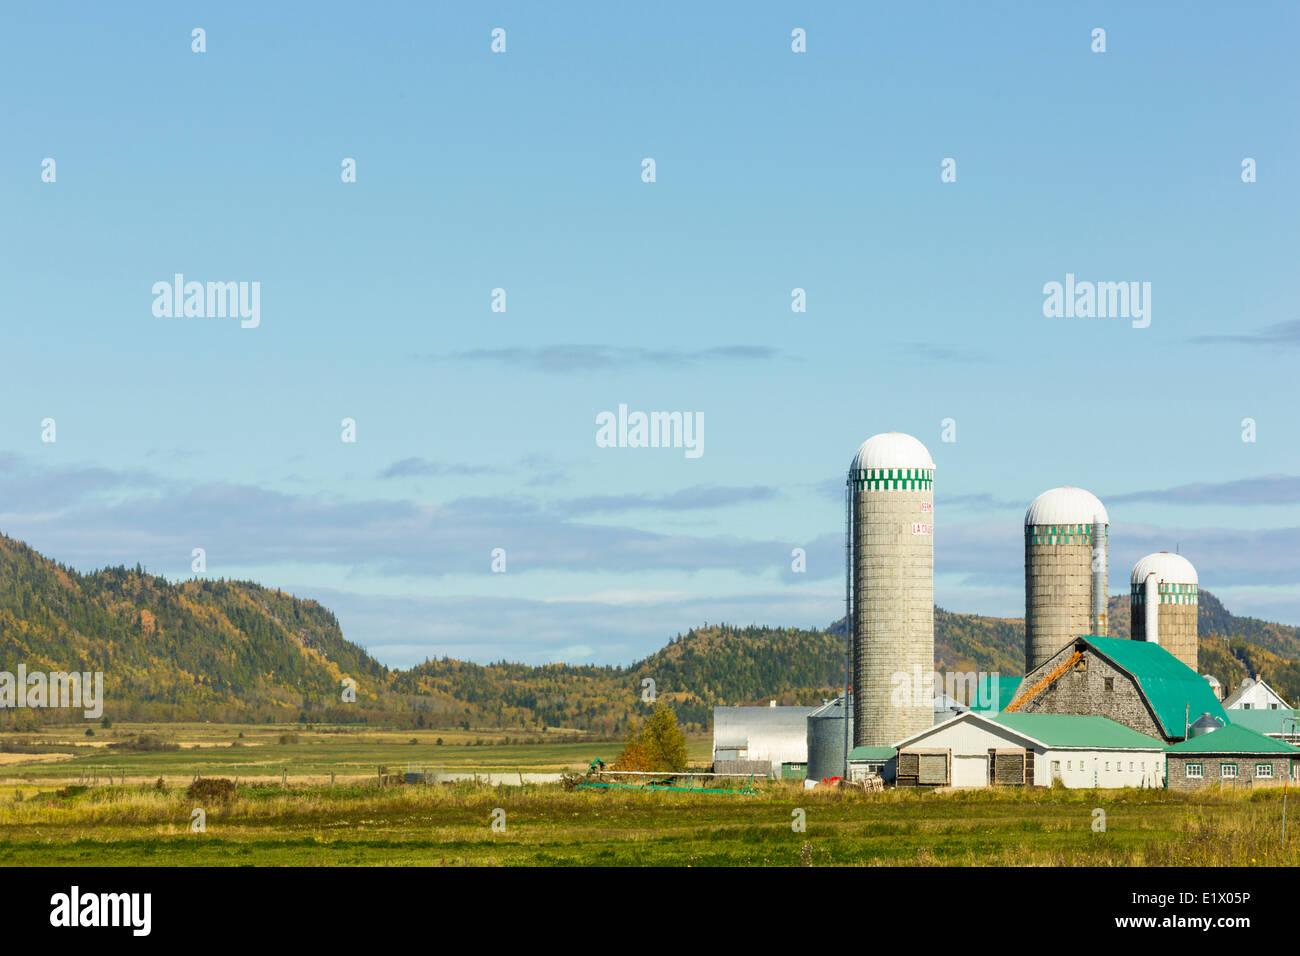 Farm, Saint-Fabian, Quebec, Canada - Stock Image